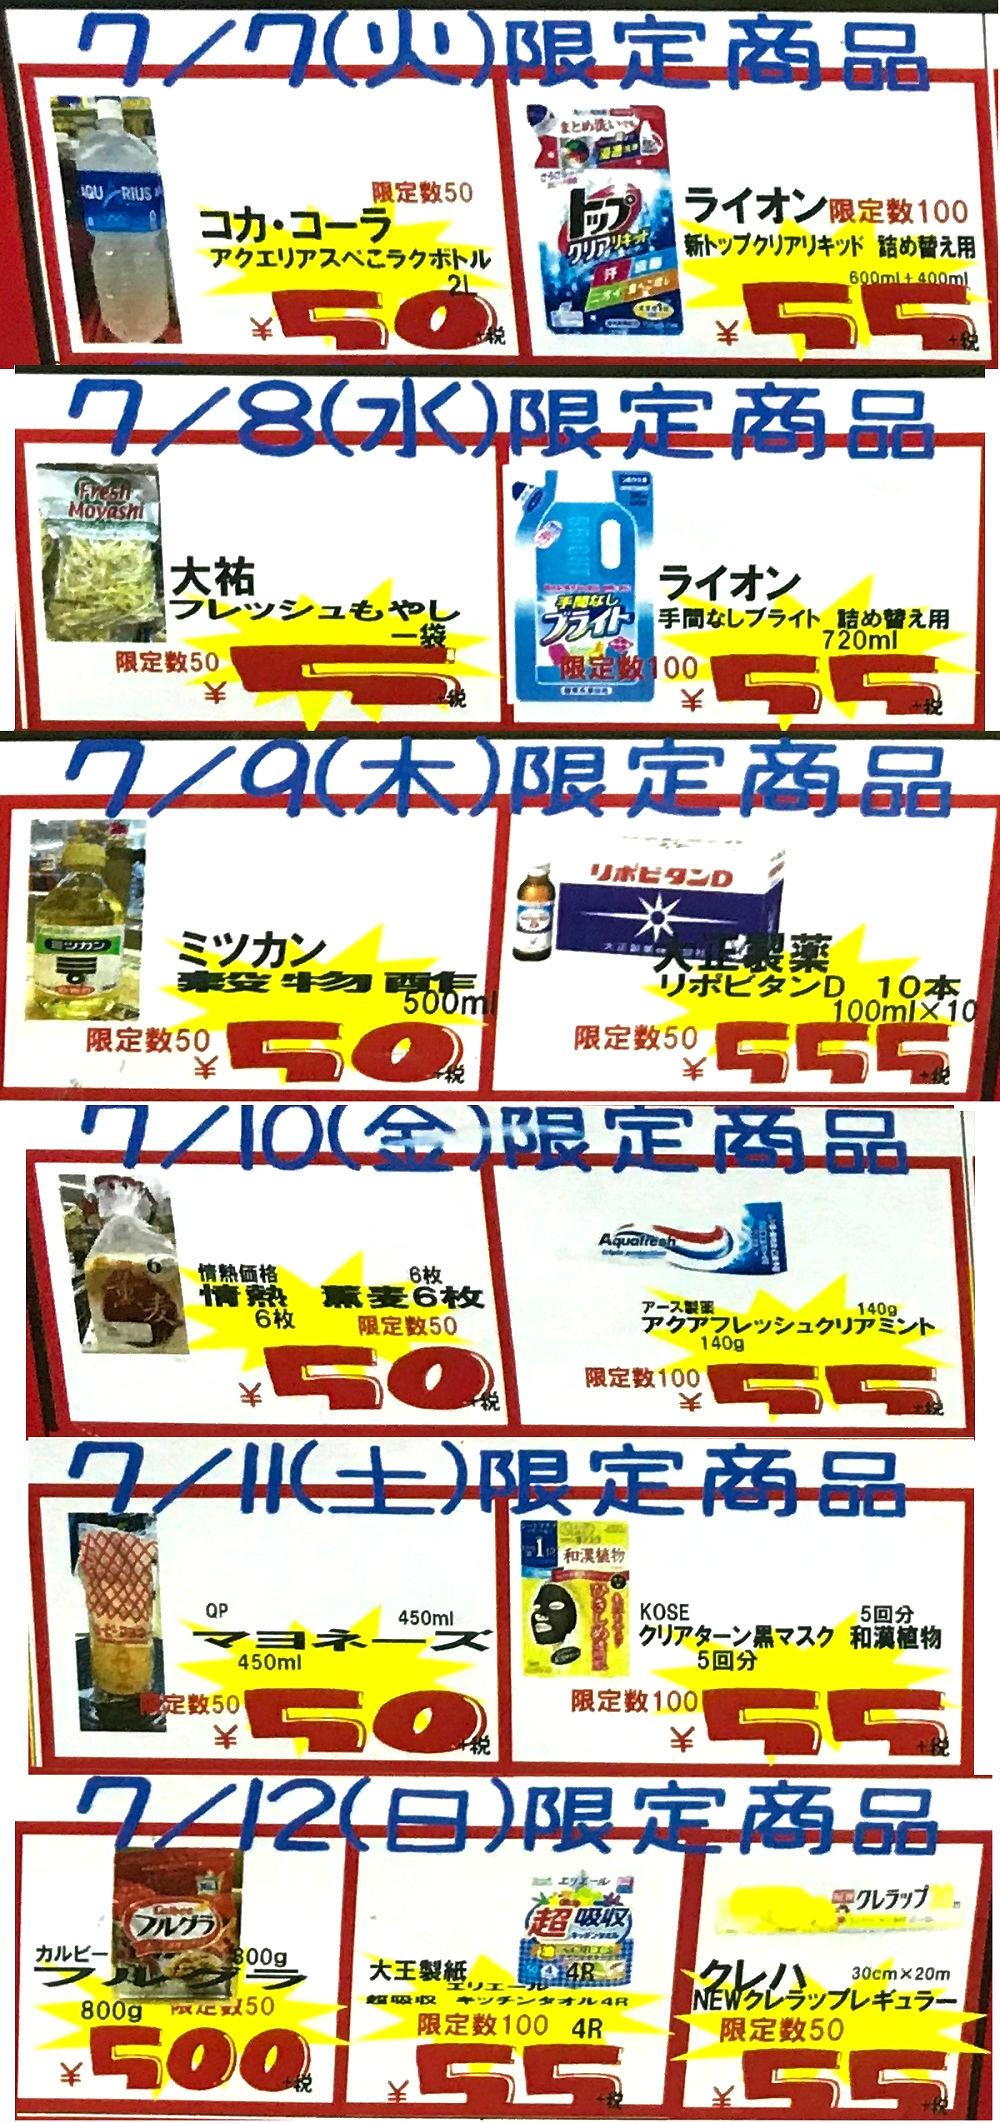 MEGAドン・キホーテ成田店の『オープン5周年記念セール』日替わり特価品